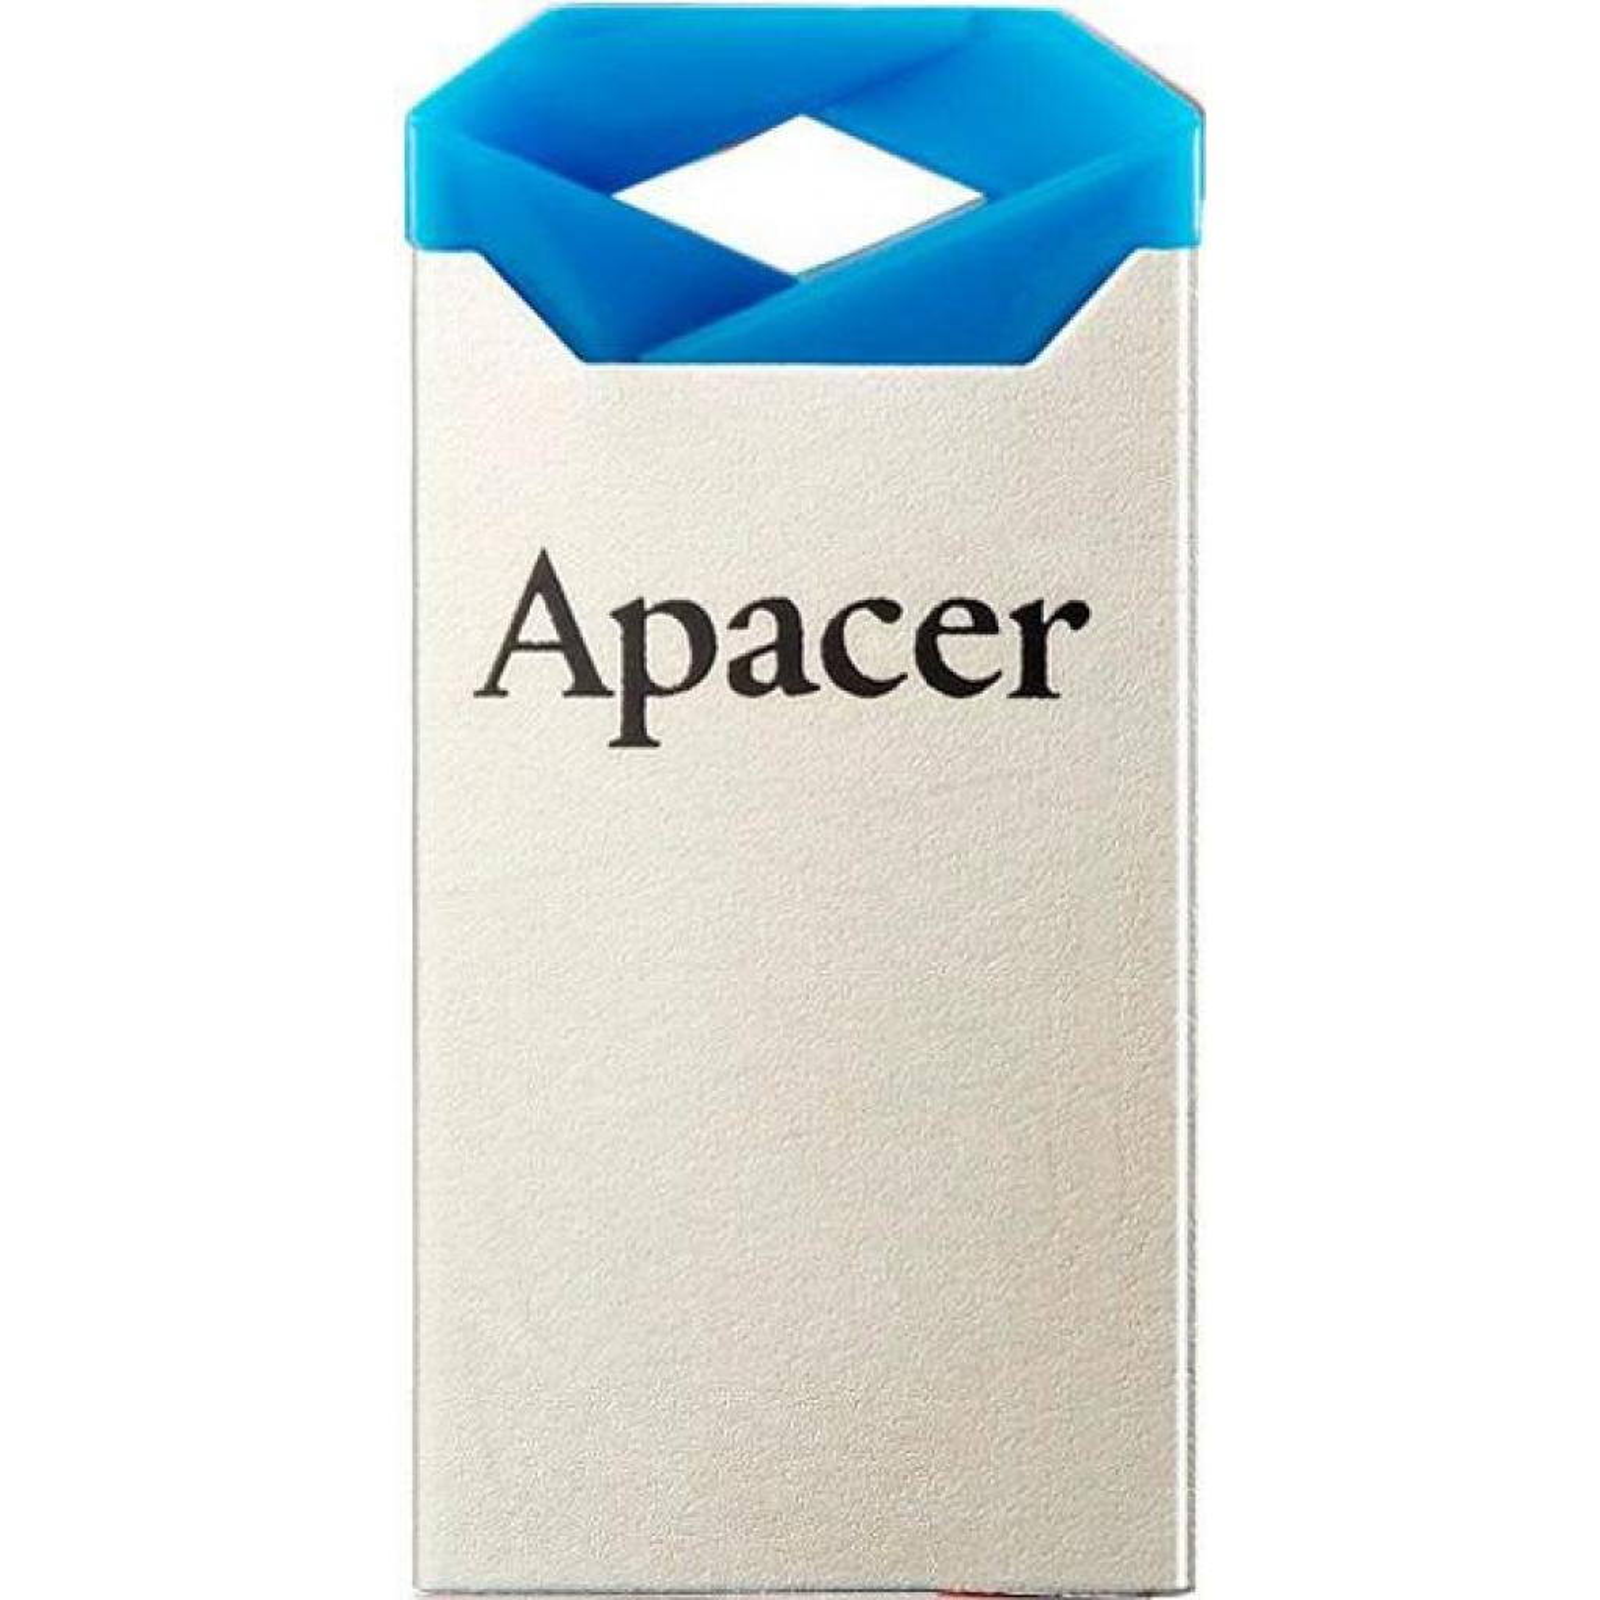 USB флеш накопитель Apacer 64GB AH111 Blue USB 2.0 (AP64GAH111U-1) изображение 2